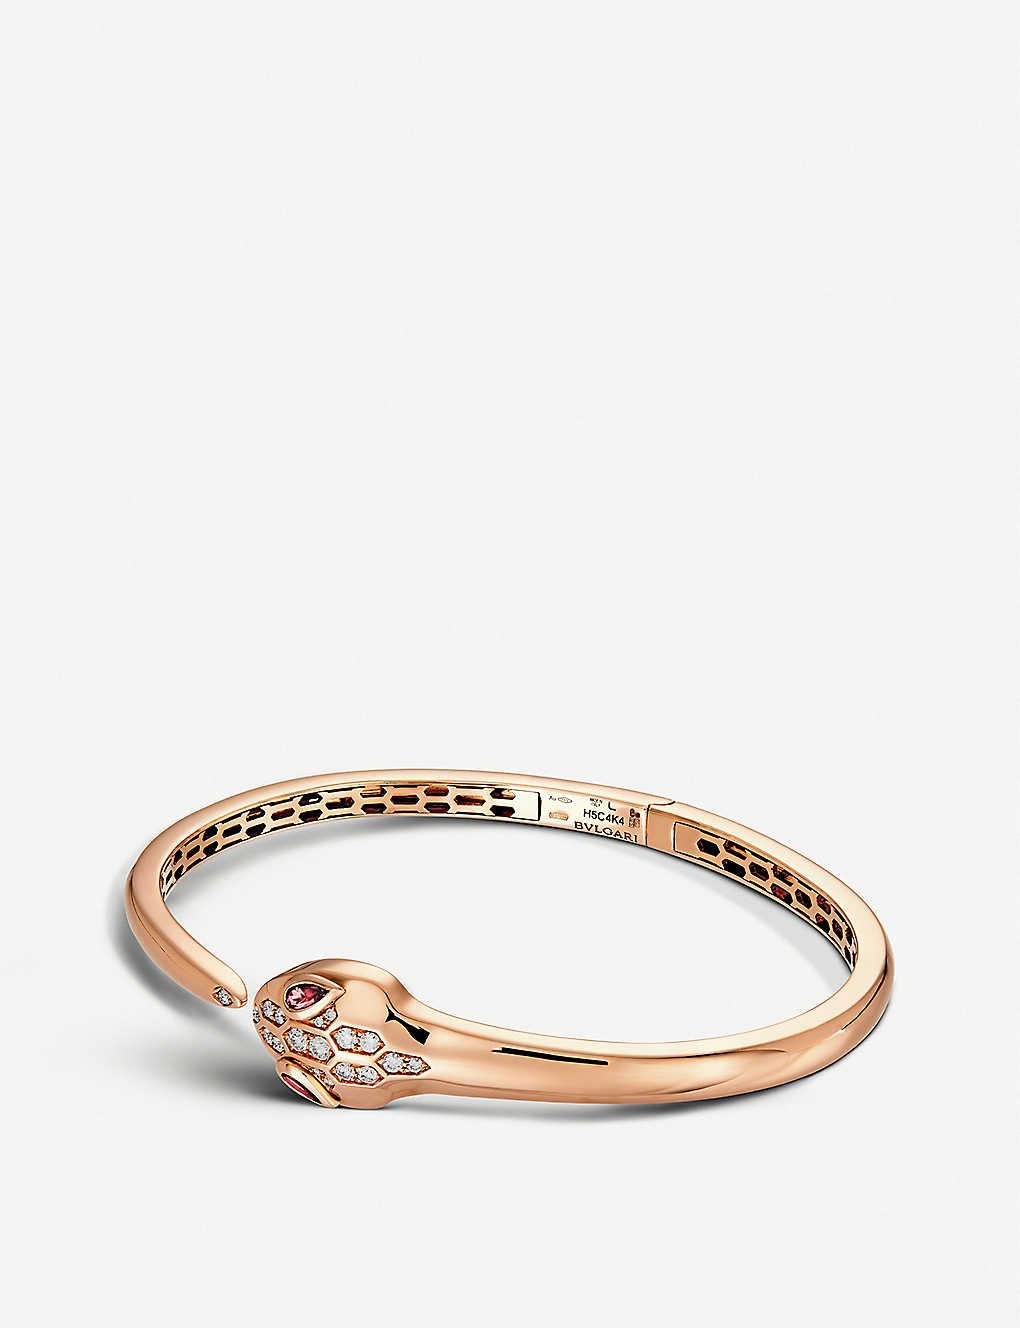 296d84d3d0b BVLGARI Serpenti Seduttori 18kt pink-gold, diamond and rubellite bracelet